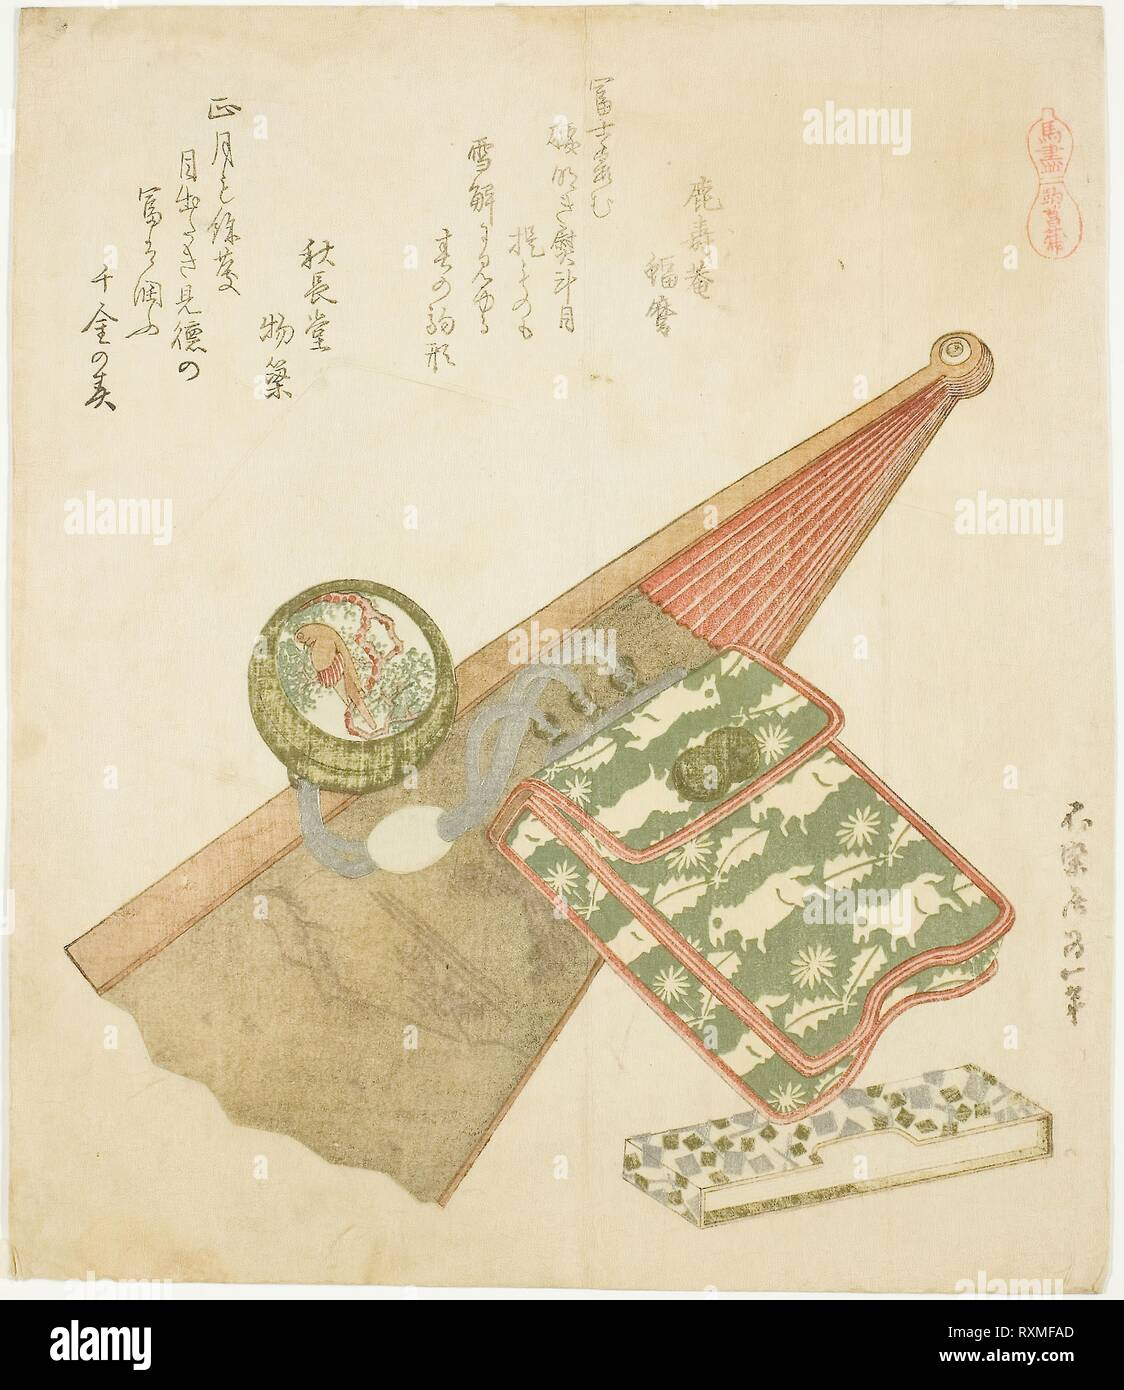 Horse Iris Pattern (Koma shobu), from the series 'A Selection of Horses (Uma-zukushi)'. Katsushika Hokusai ?? ??; Japanese, 1760-1849. Date: 1822. Dimensions: 20.7 x 17.8 cm. Color woodblock print; shikishiban, surimono. Origin: Japan. Museum: The Chicago Art Institute. - Stock Image